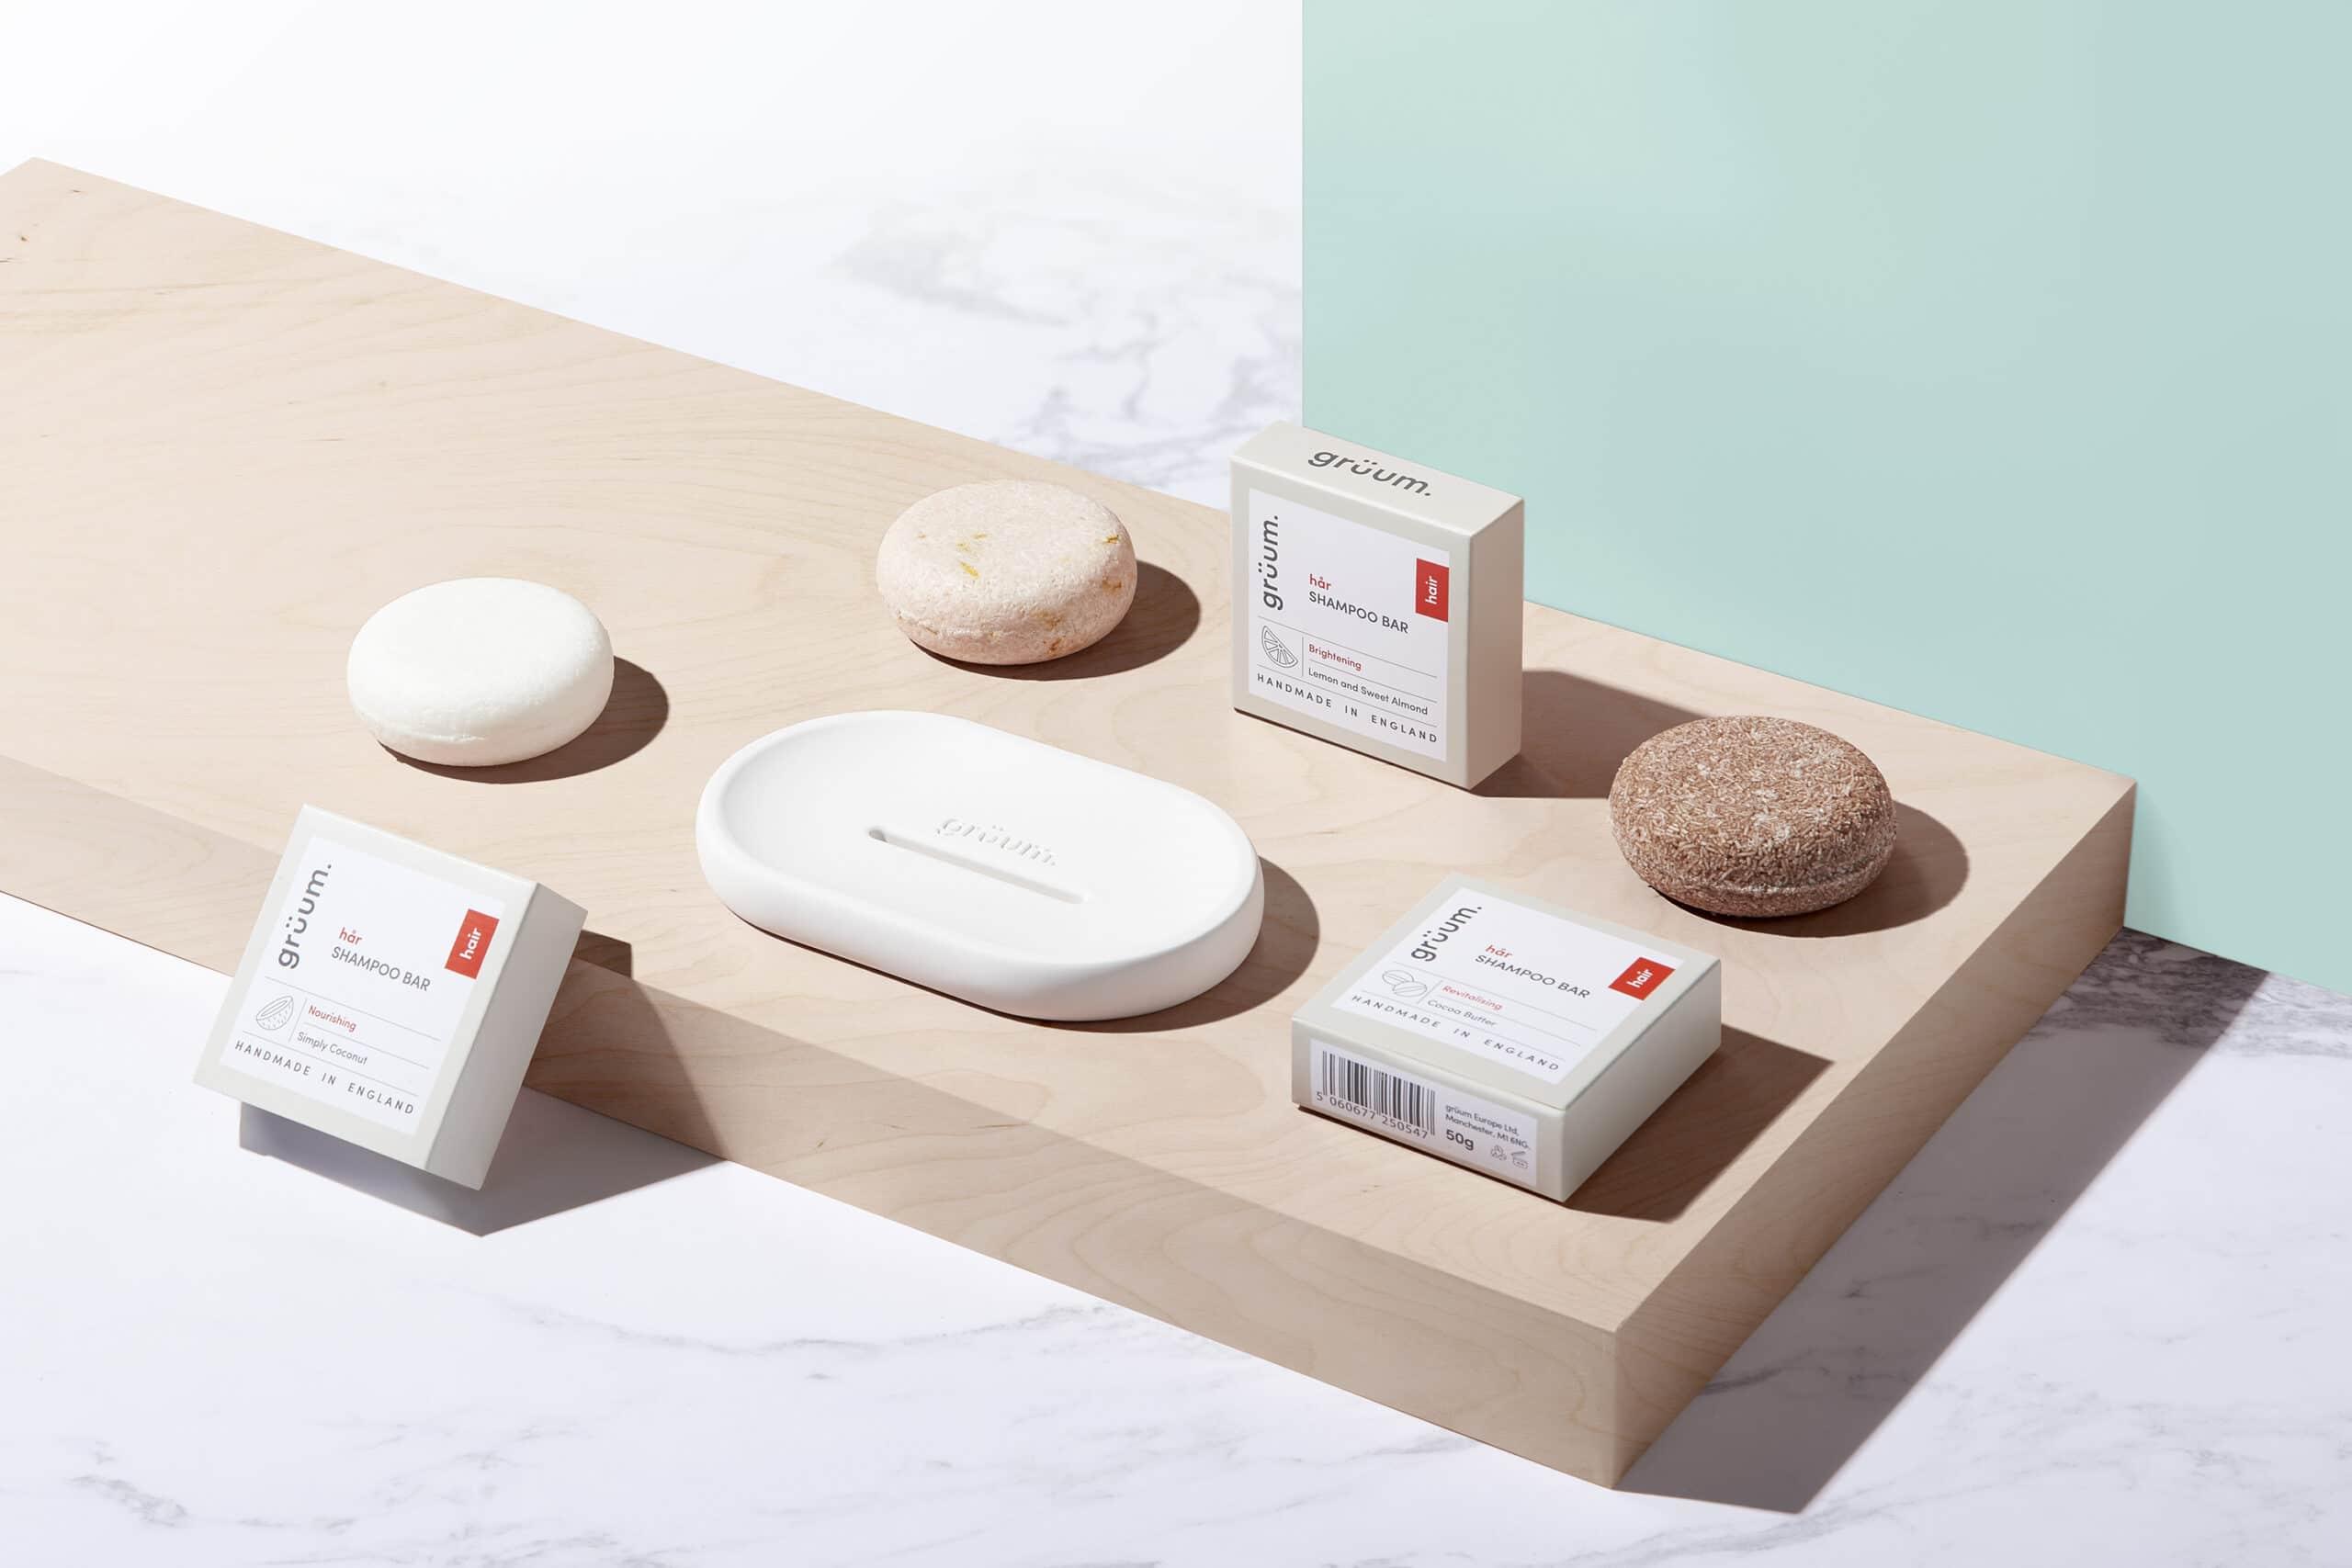 Gruum Shampoo Bar Trio product image with the nourishing, revitalising and brightening shampoo bars and white halla soap dish with Zero plastic